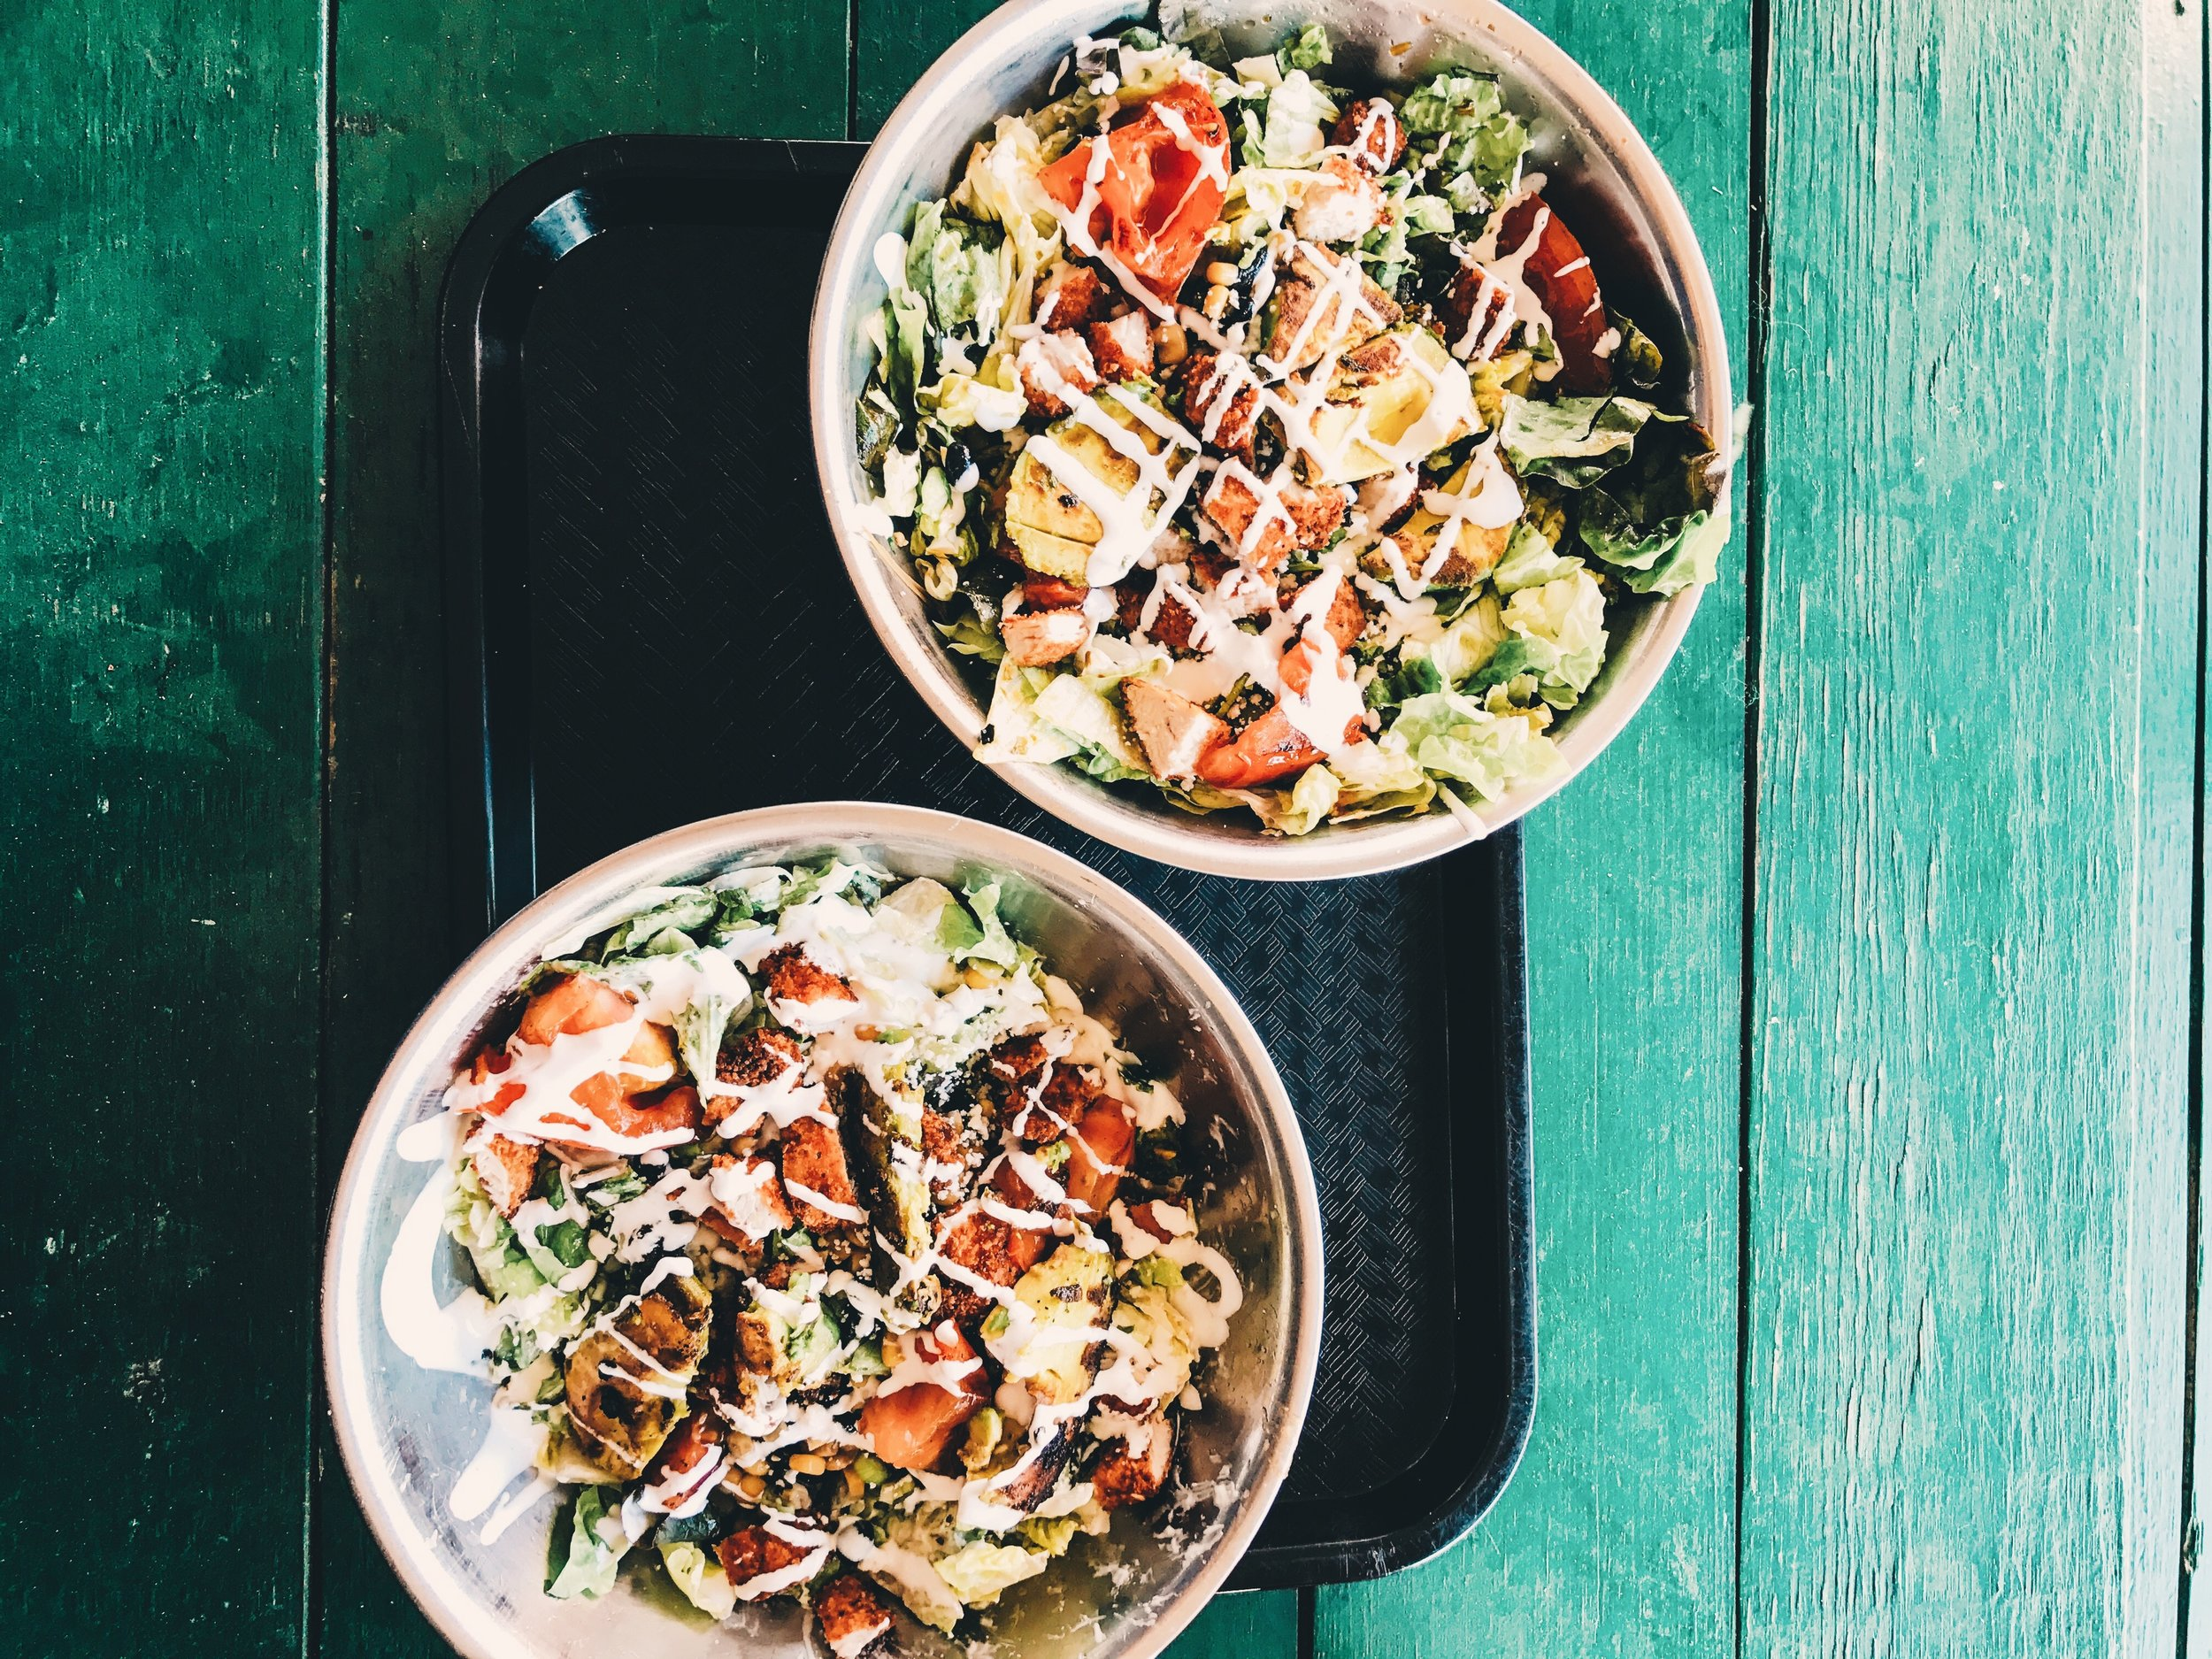 Snappy Salads - Grilled Avocado w/ Crunchy Chicken (both)